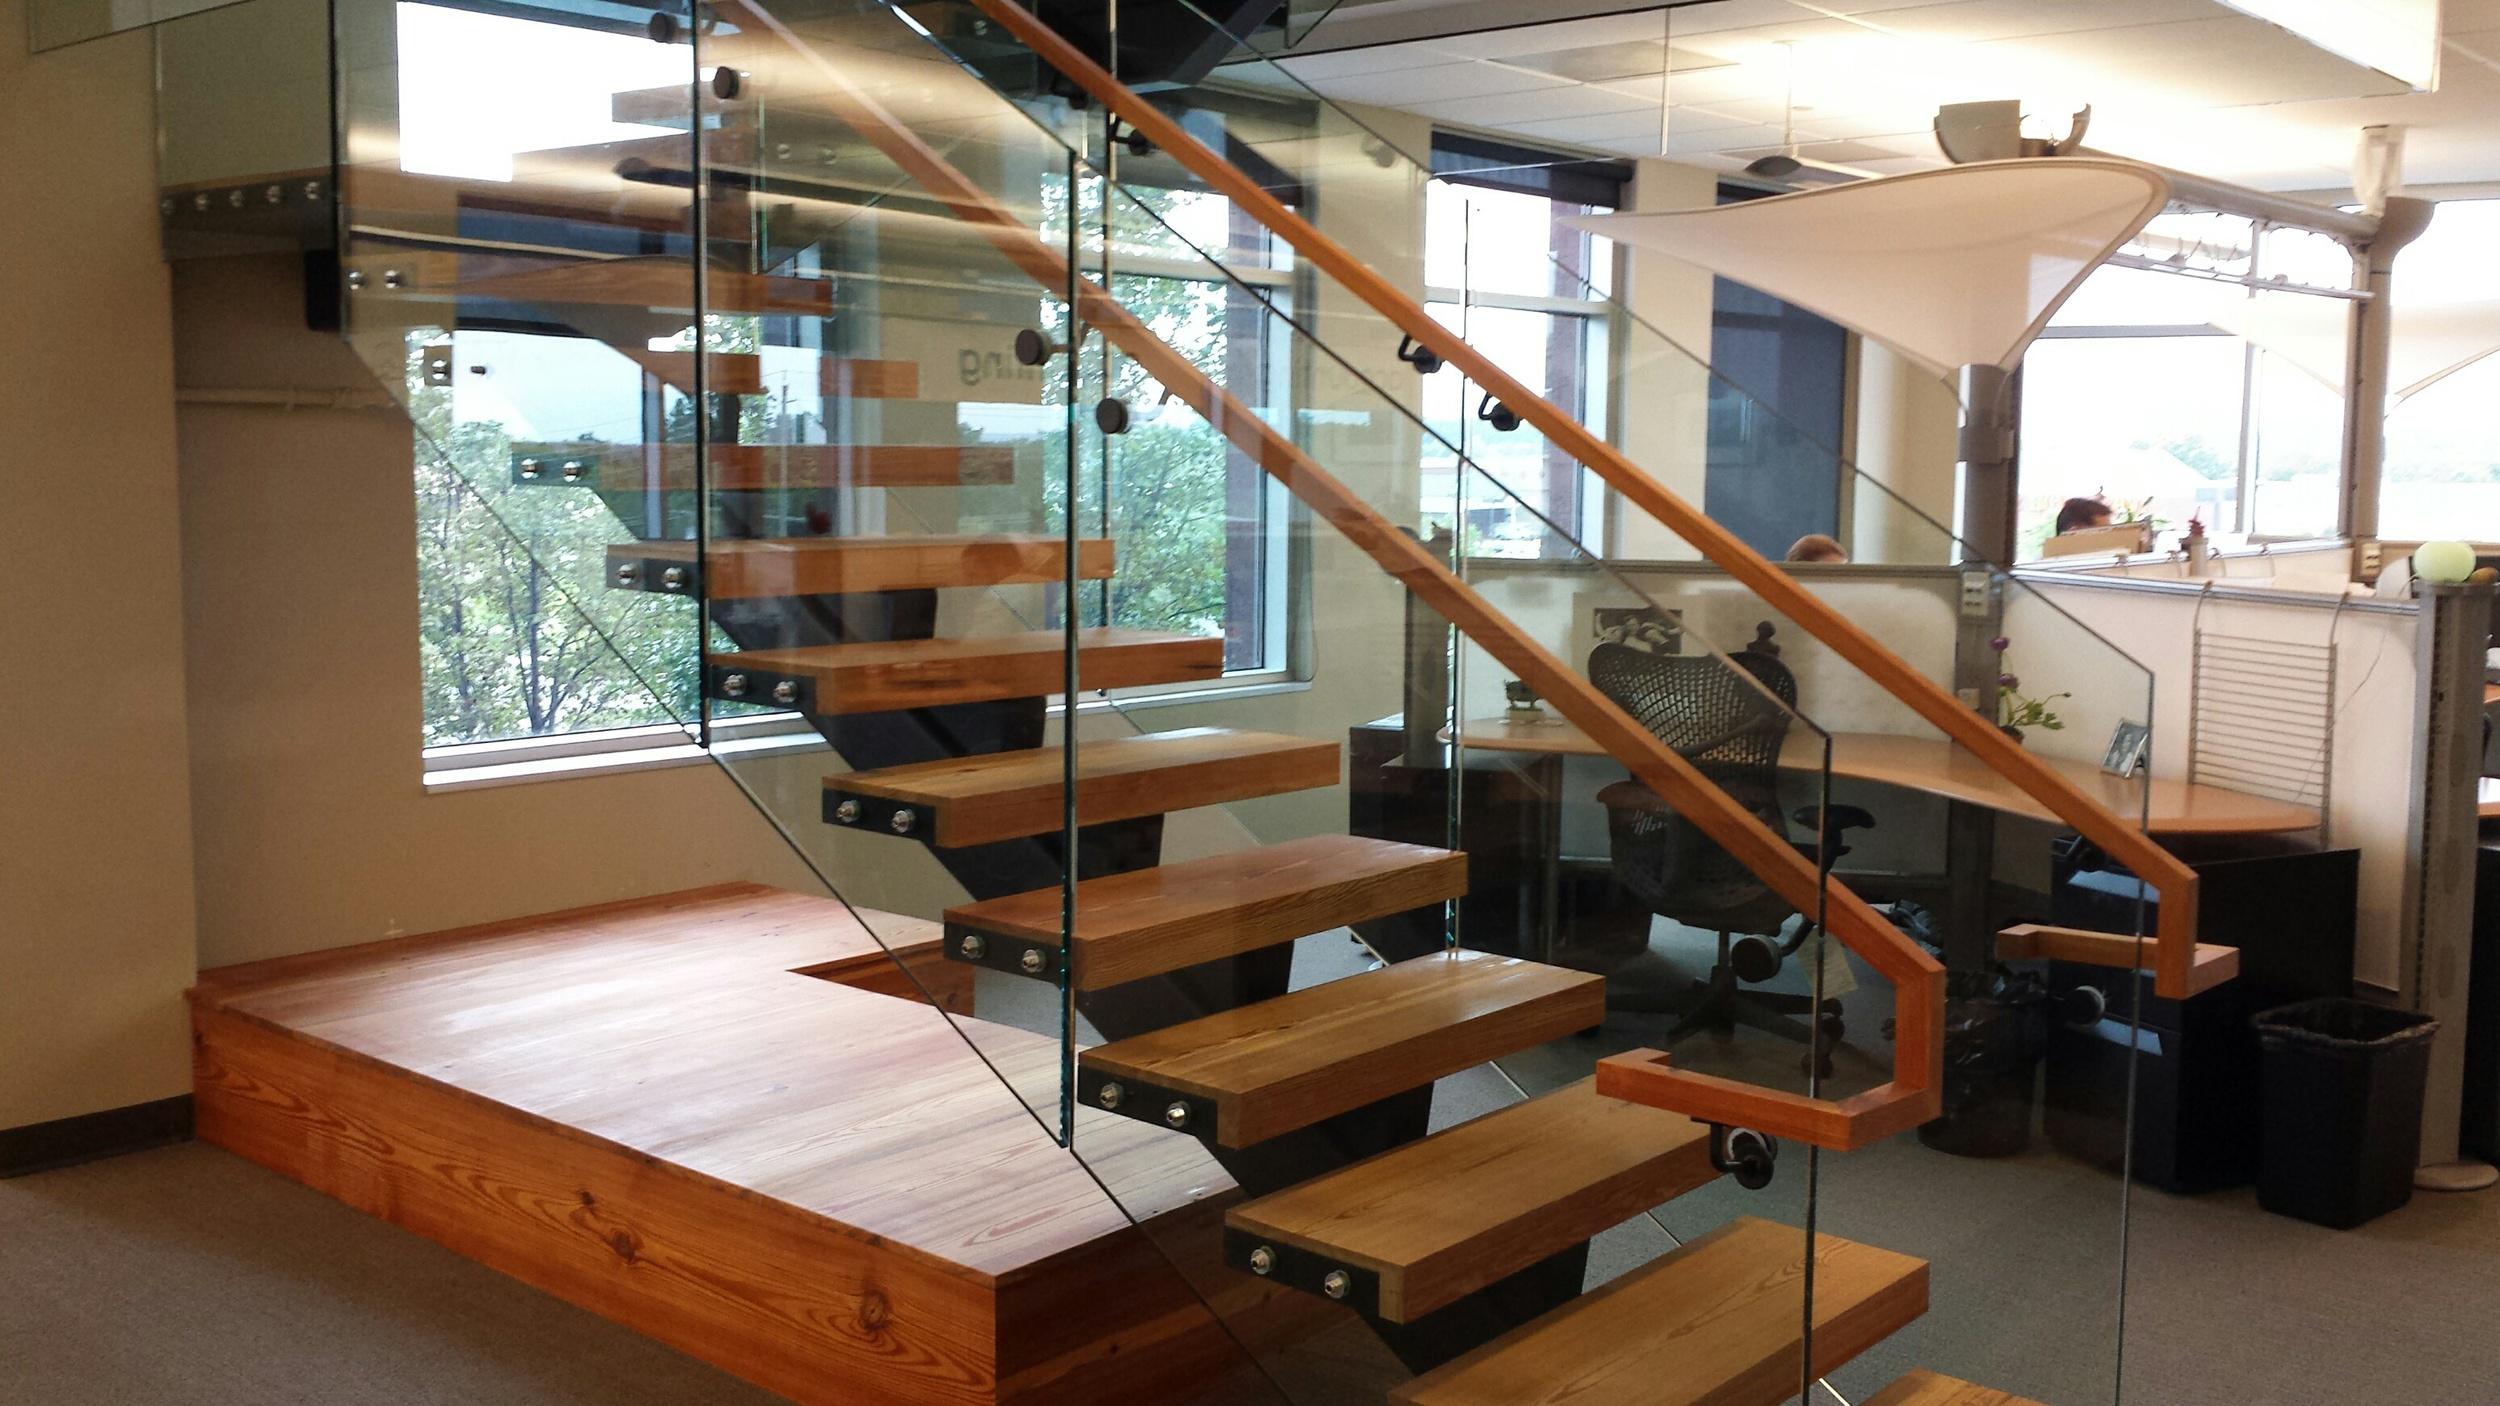 13-3- 09-11-14- Stairs- 2nd Floor- Northwest View- 2.jpg